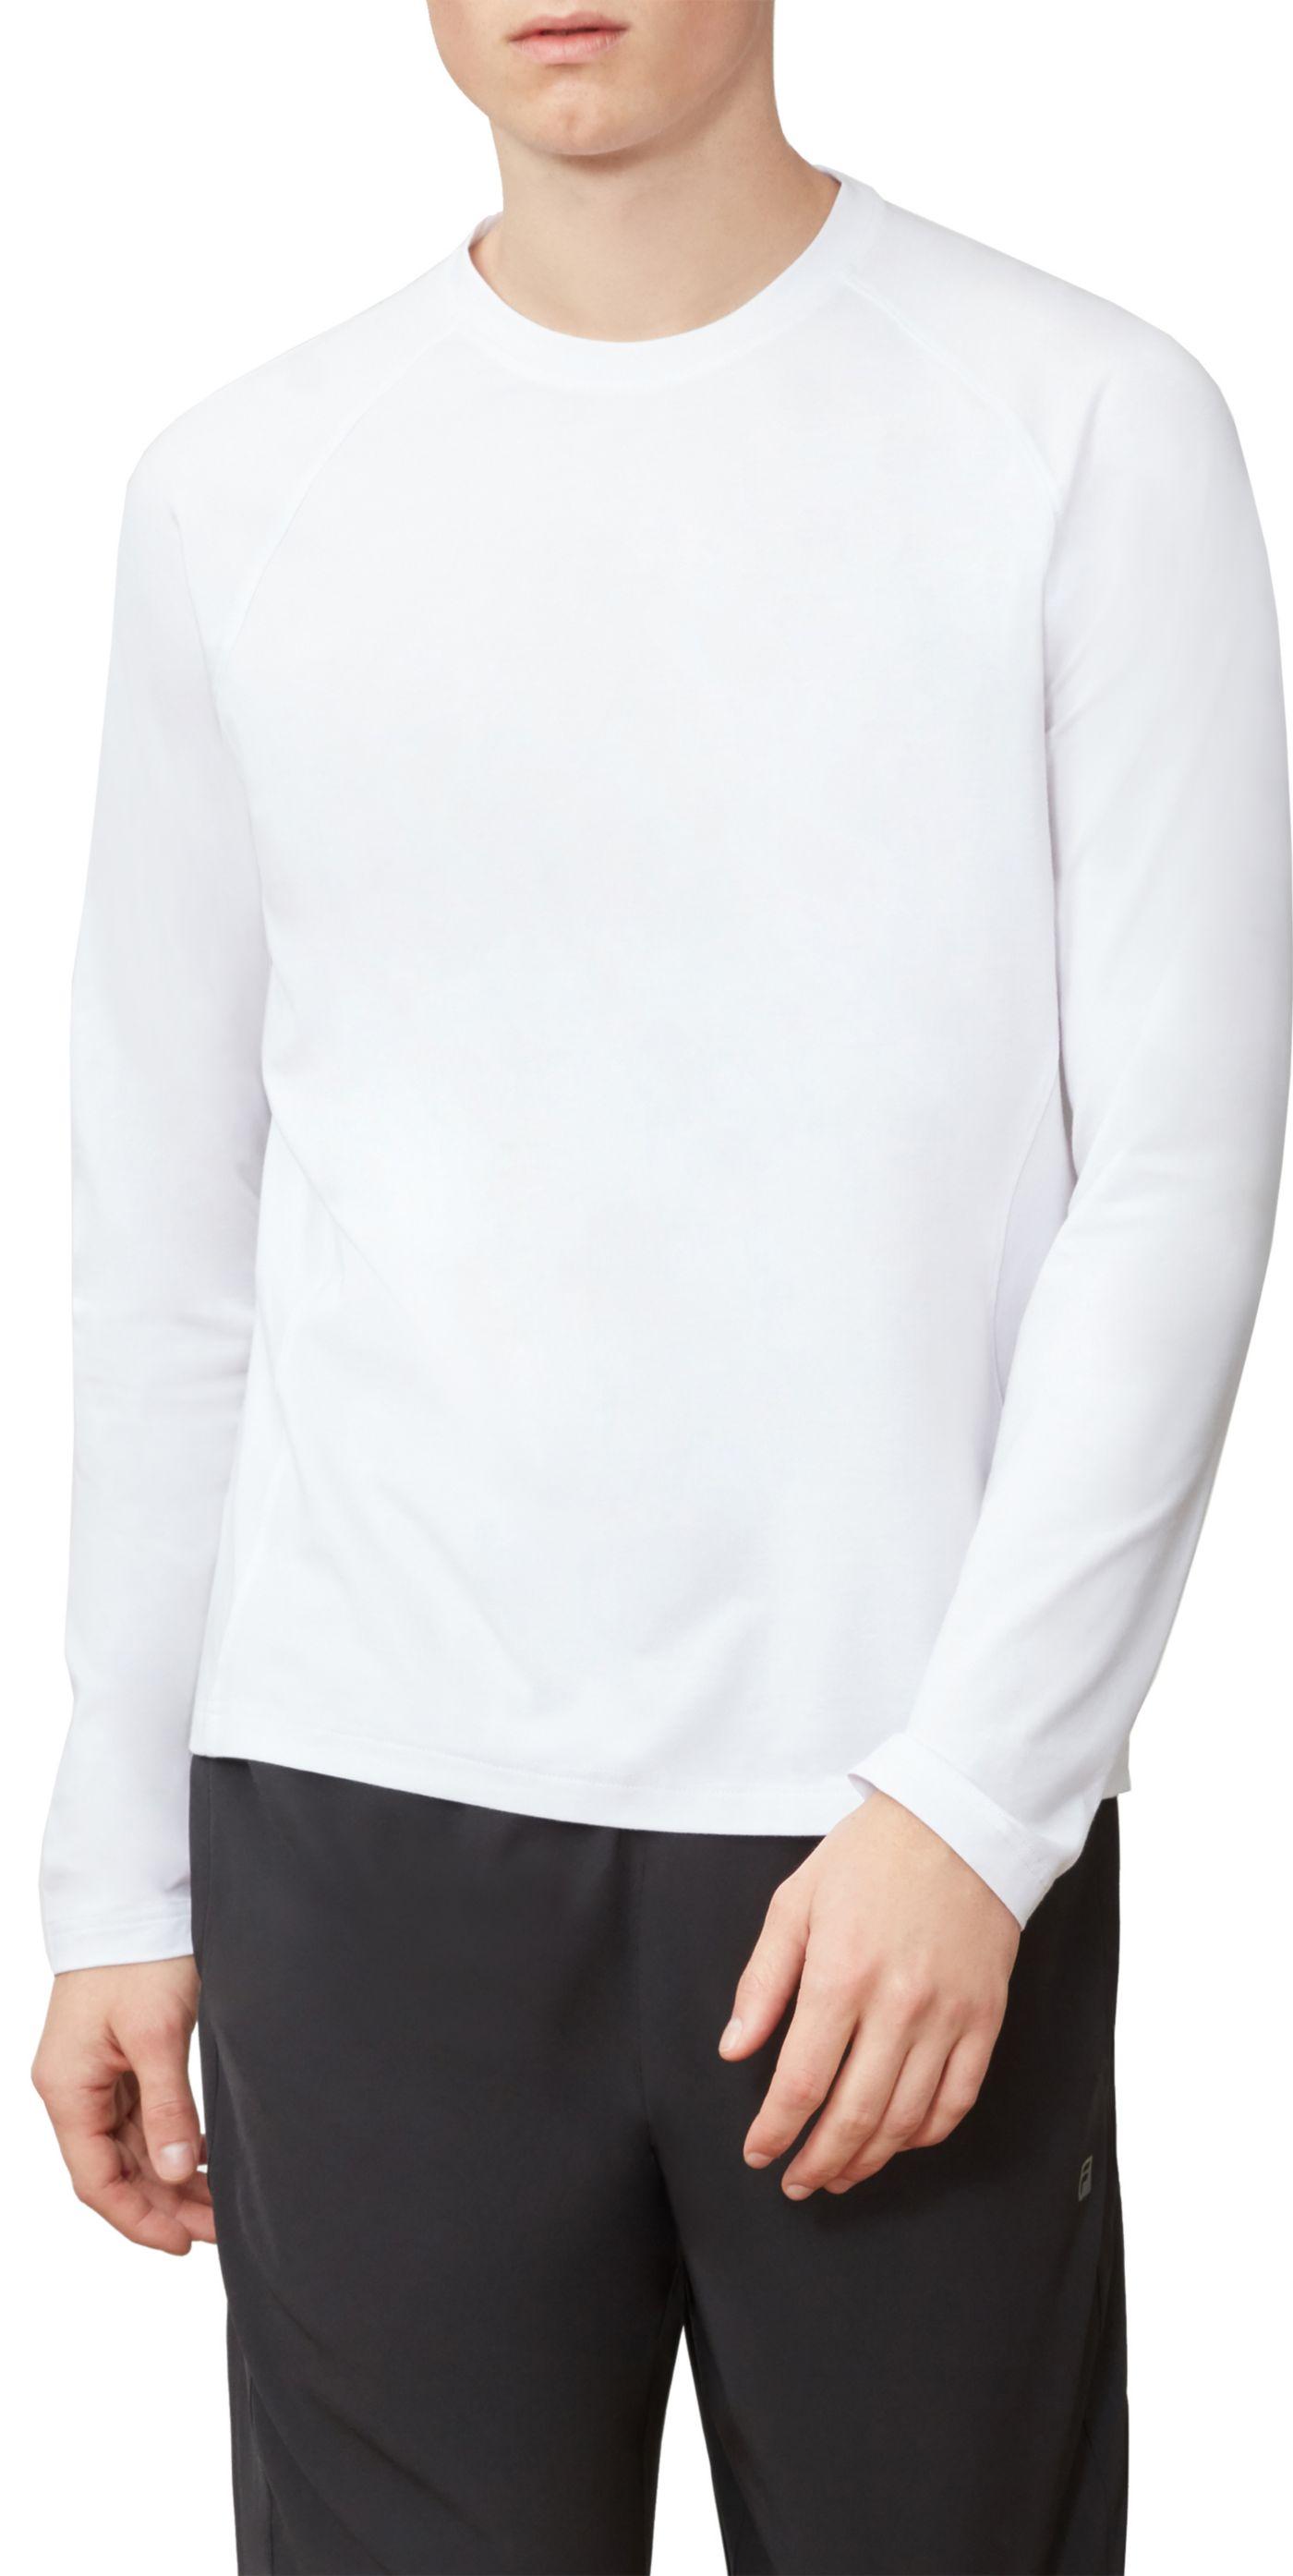 Fila Men's UV Blocker Long Sleeve Shirt